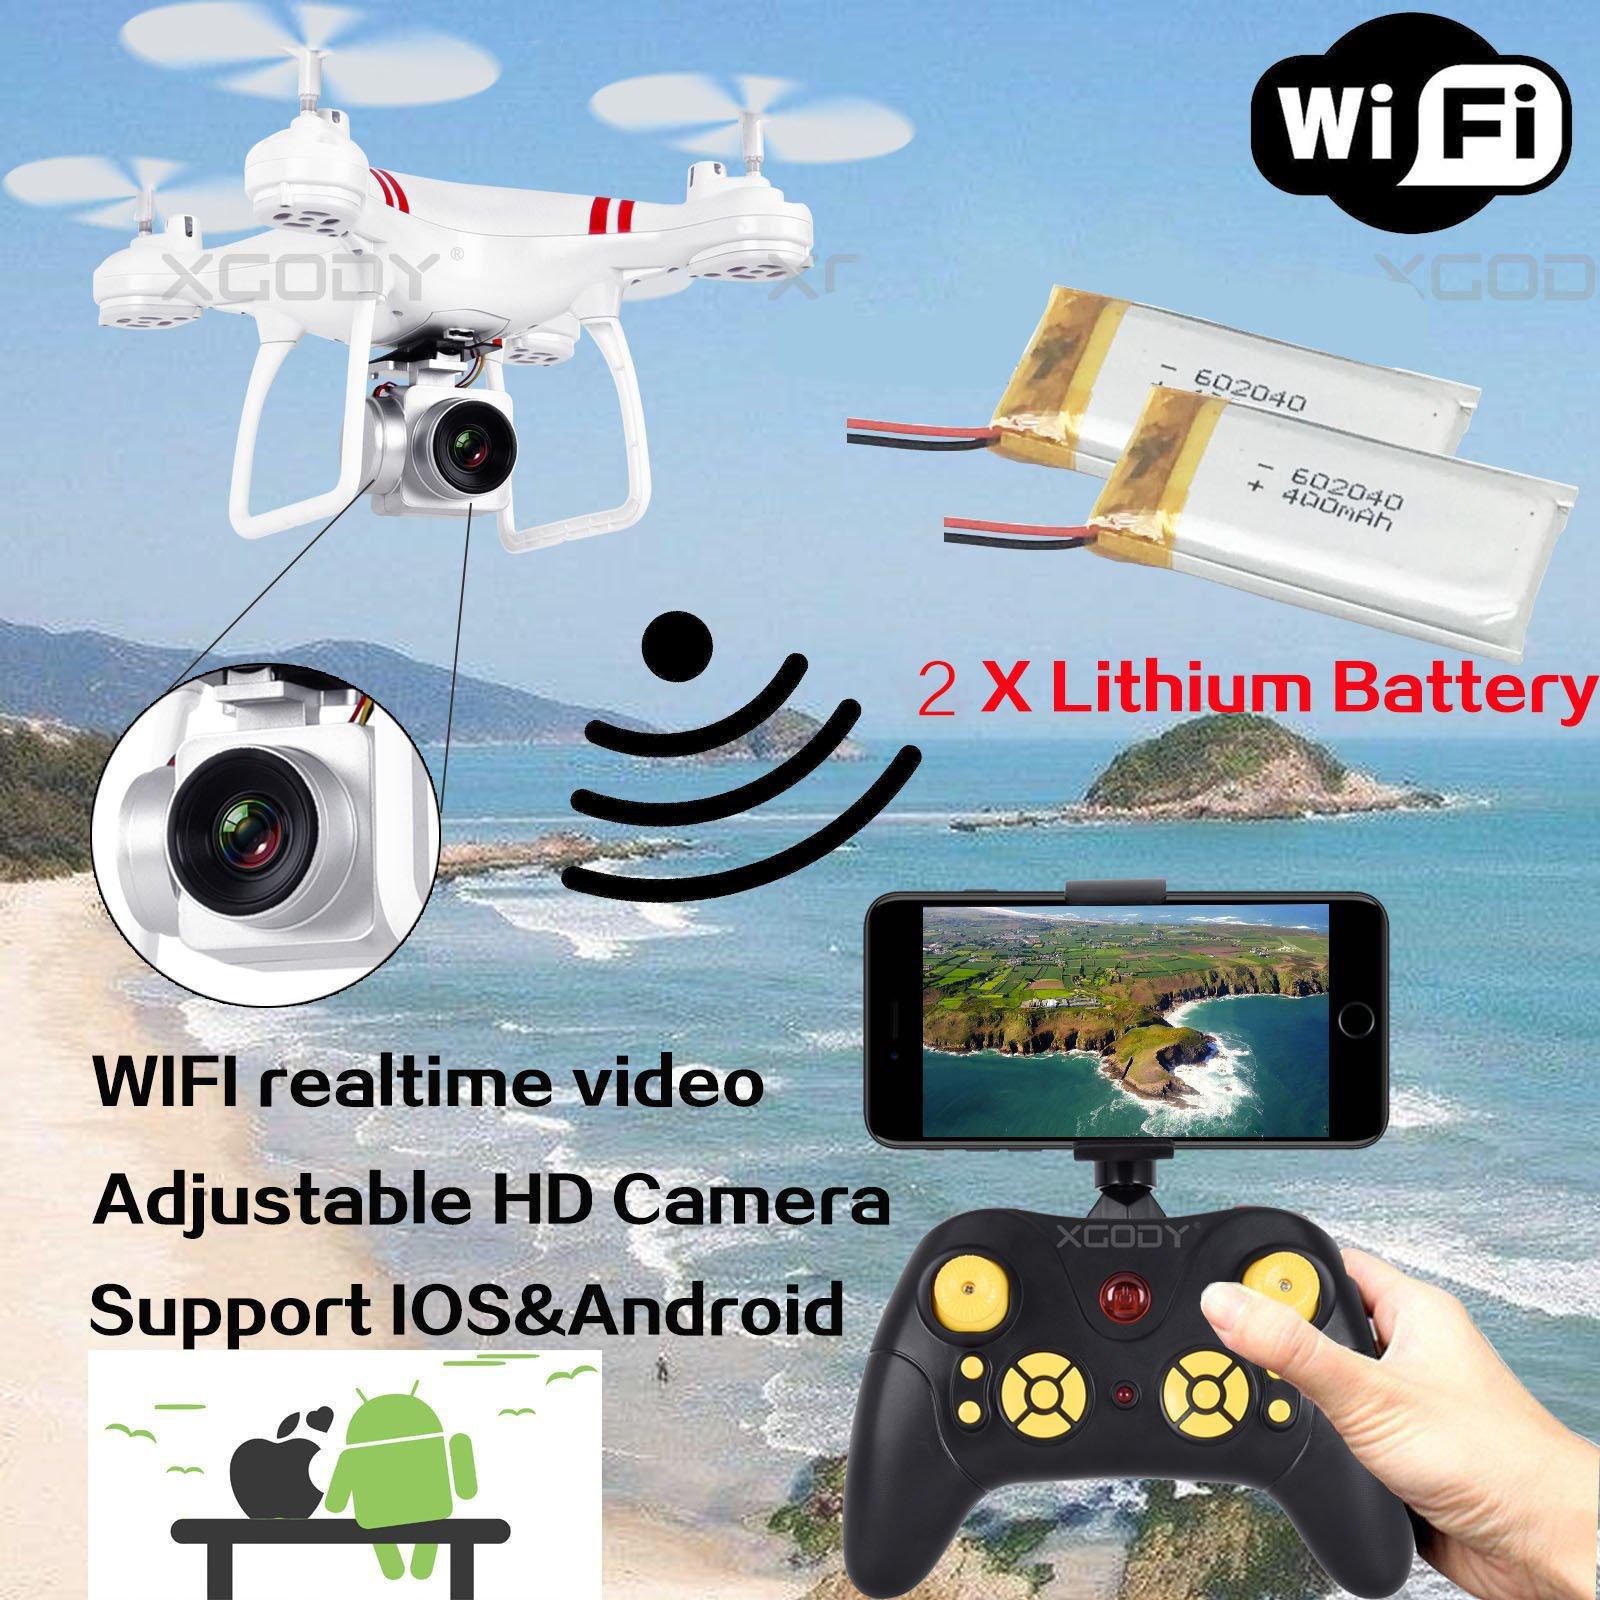 WIFI Camera Drone FPV 2.4Ghz 4CH 6-Axis RC Quadcopter HD RTF Explorer 360 Flip